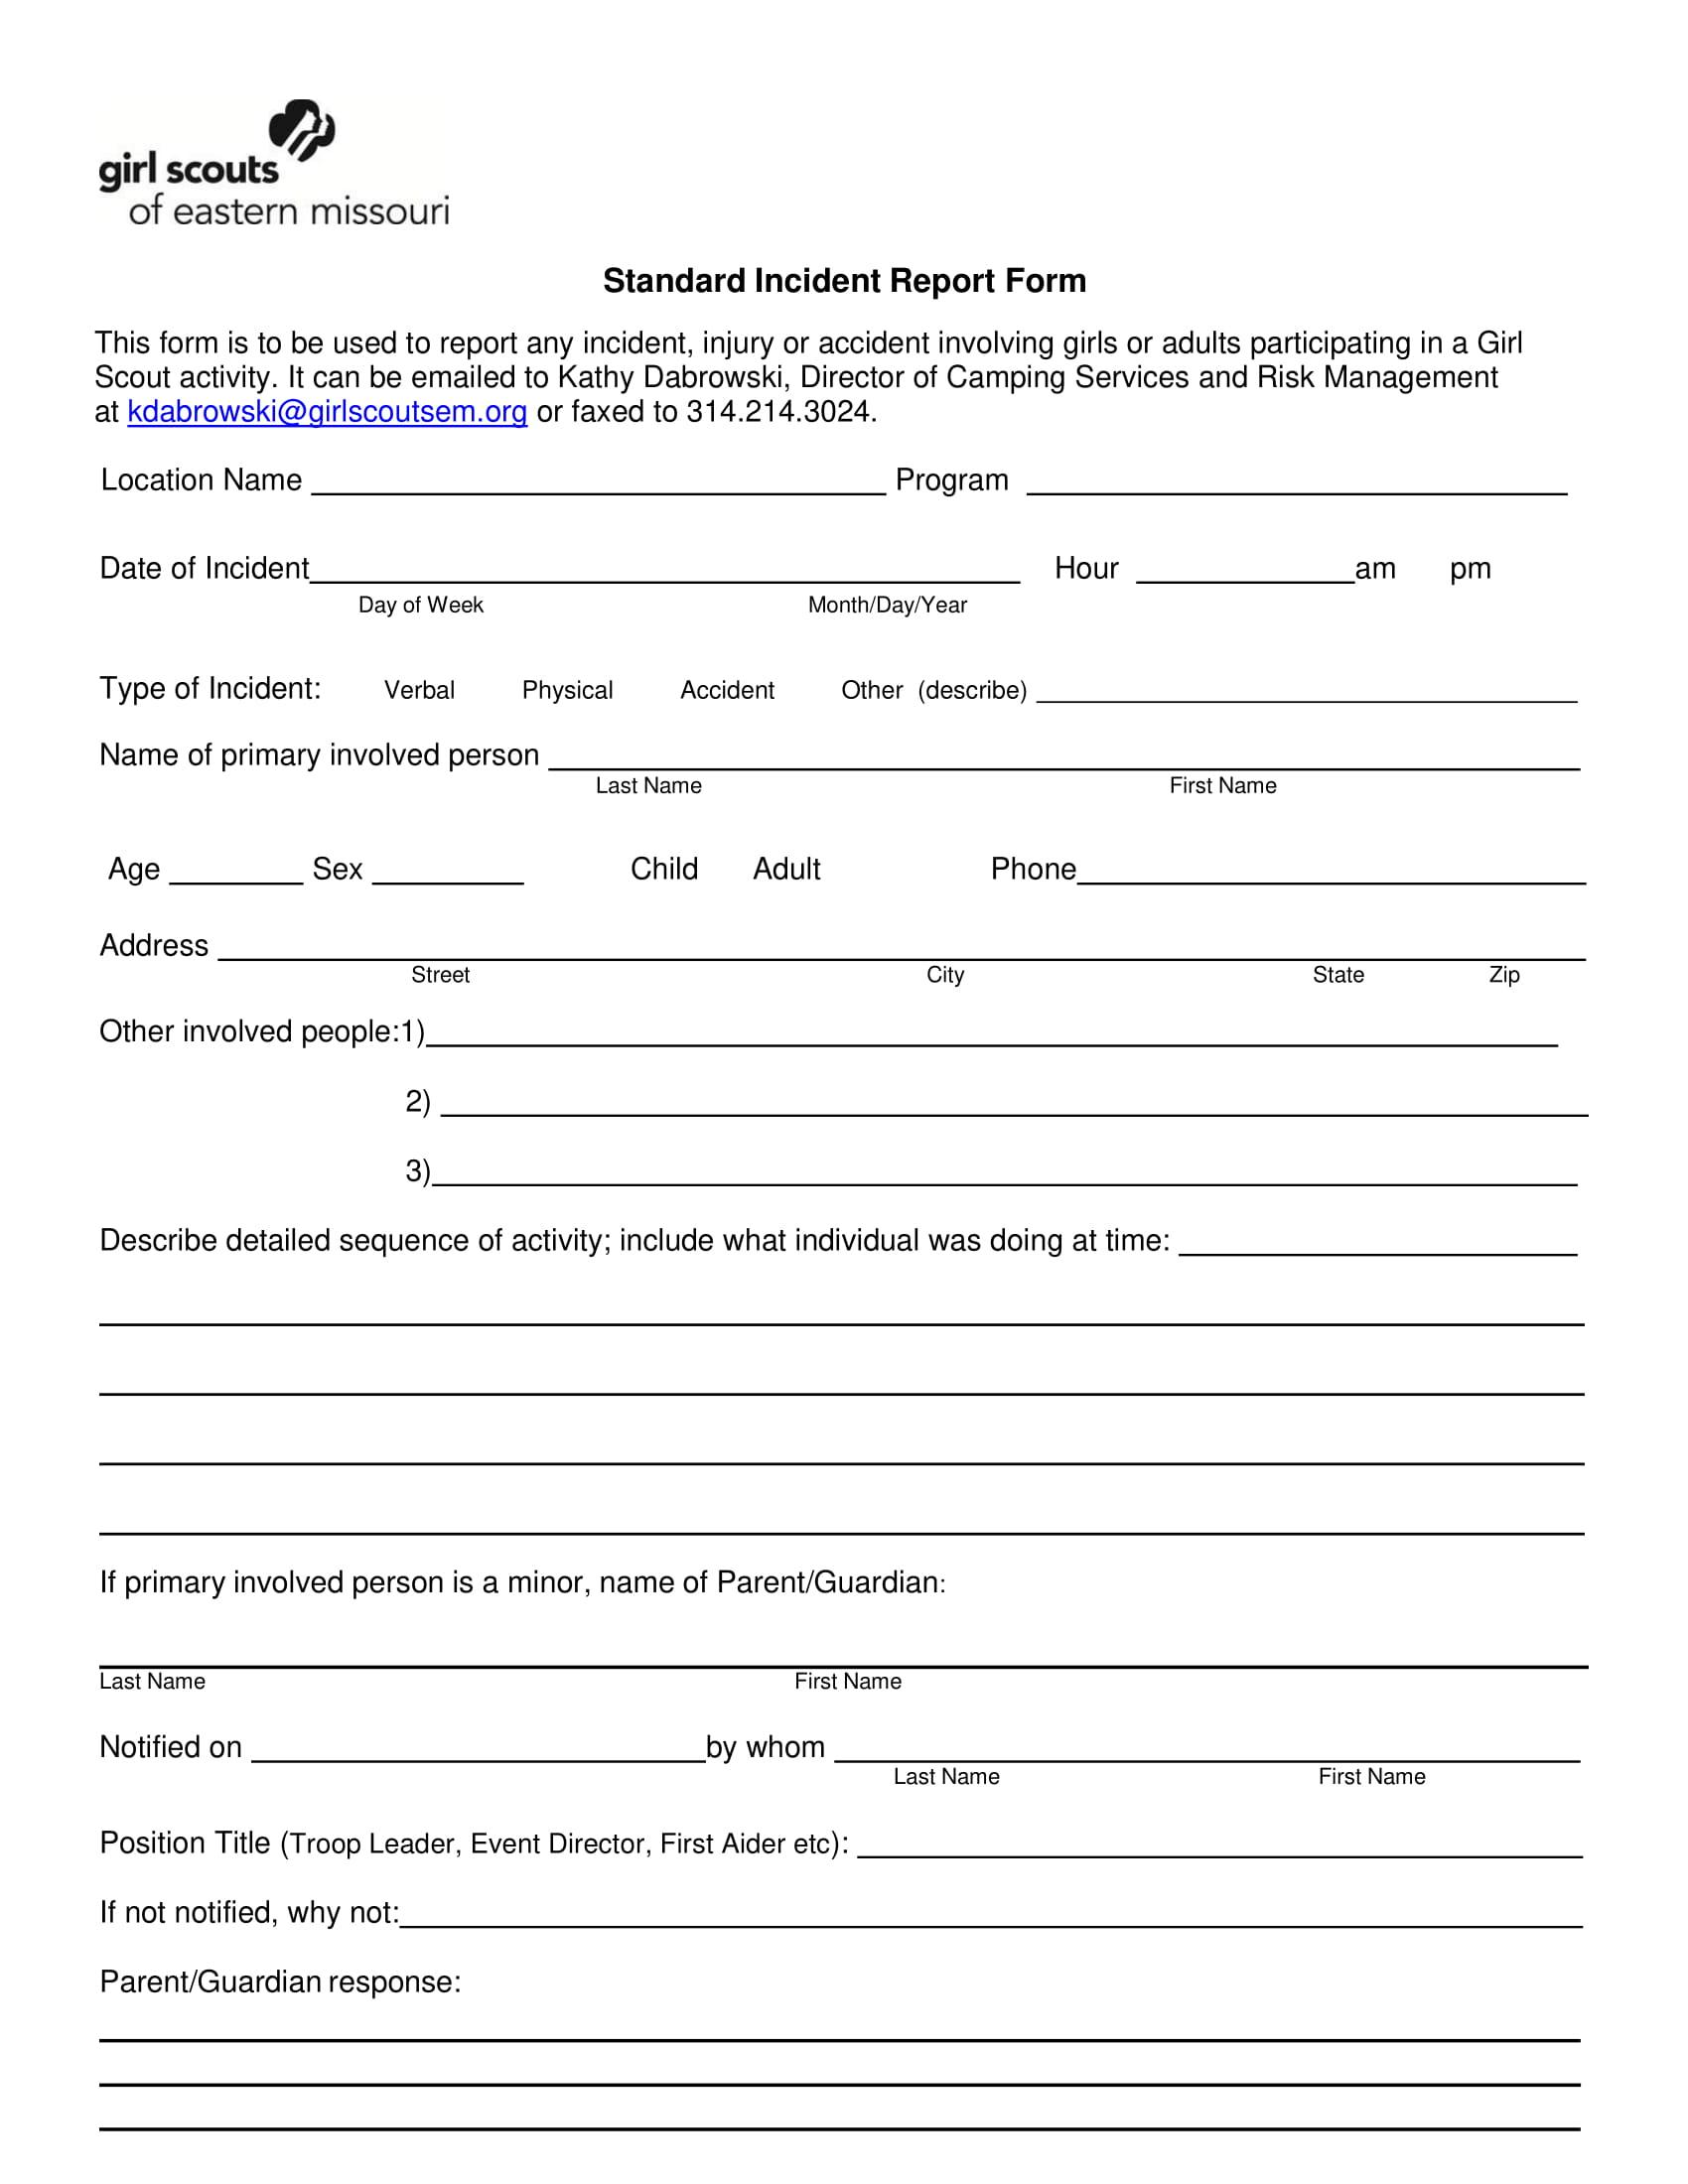 standard incident report form 1